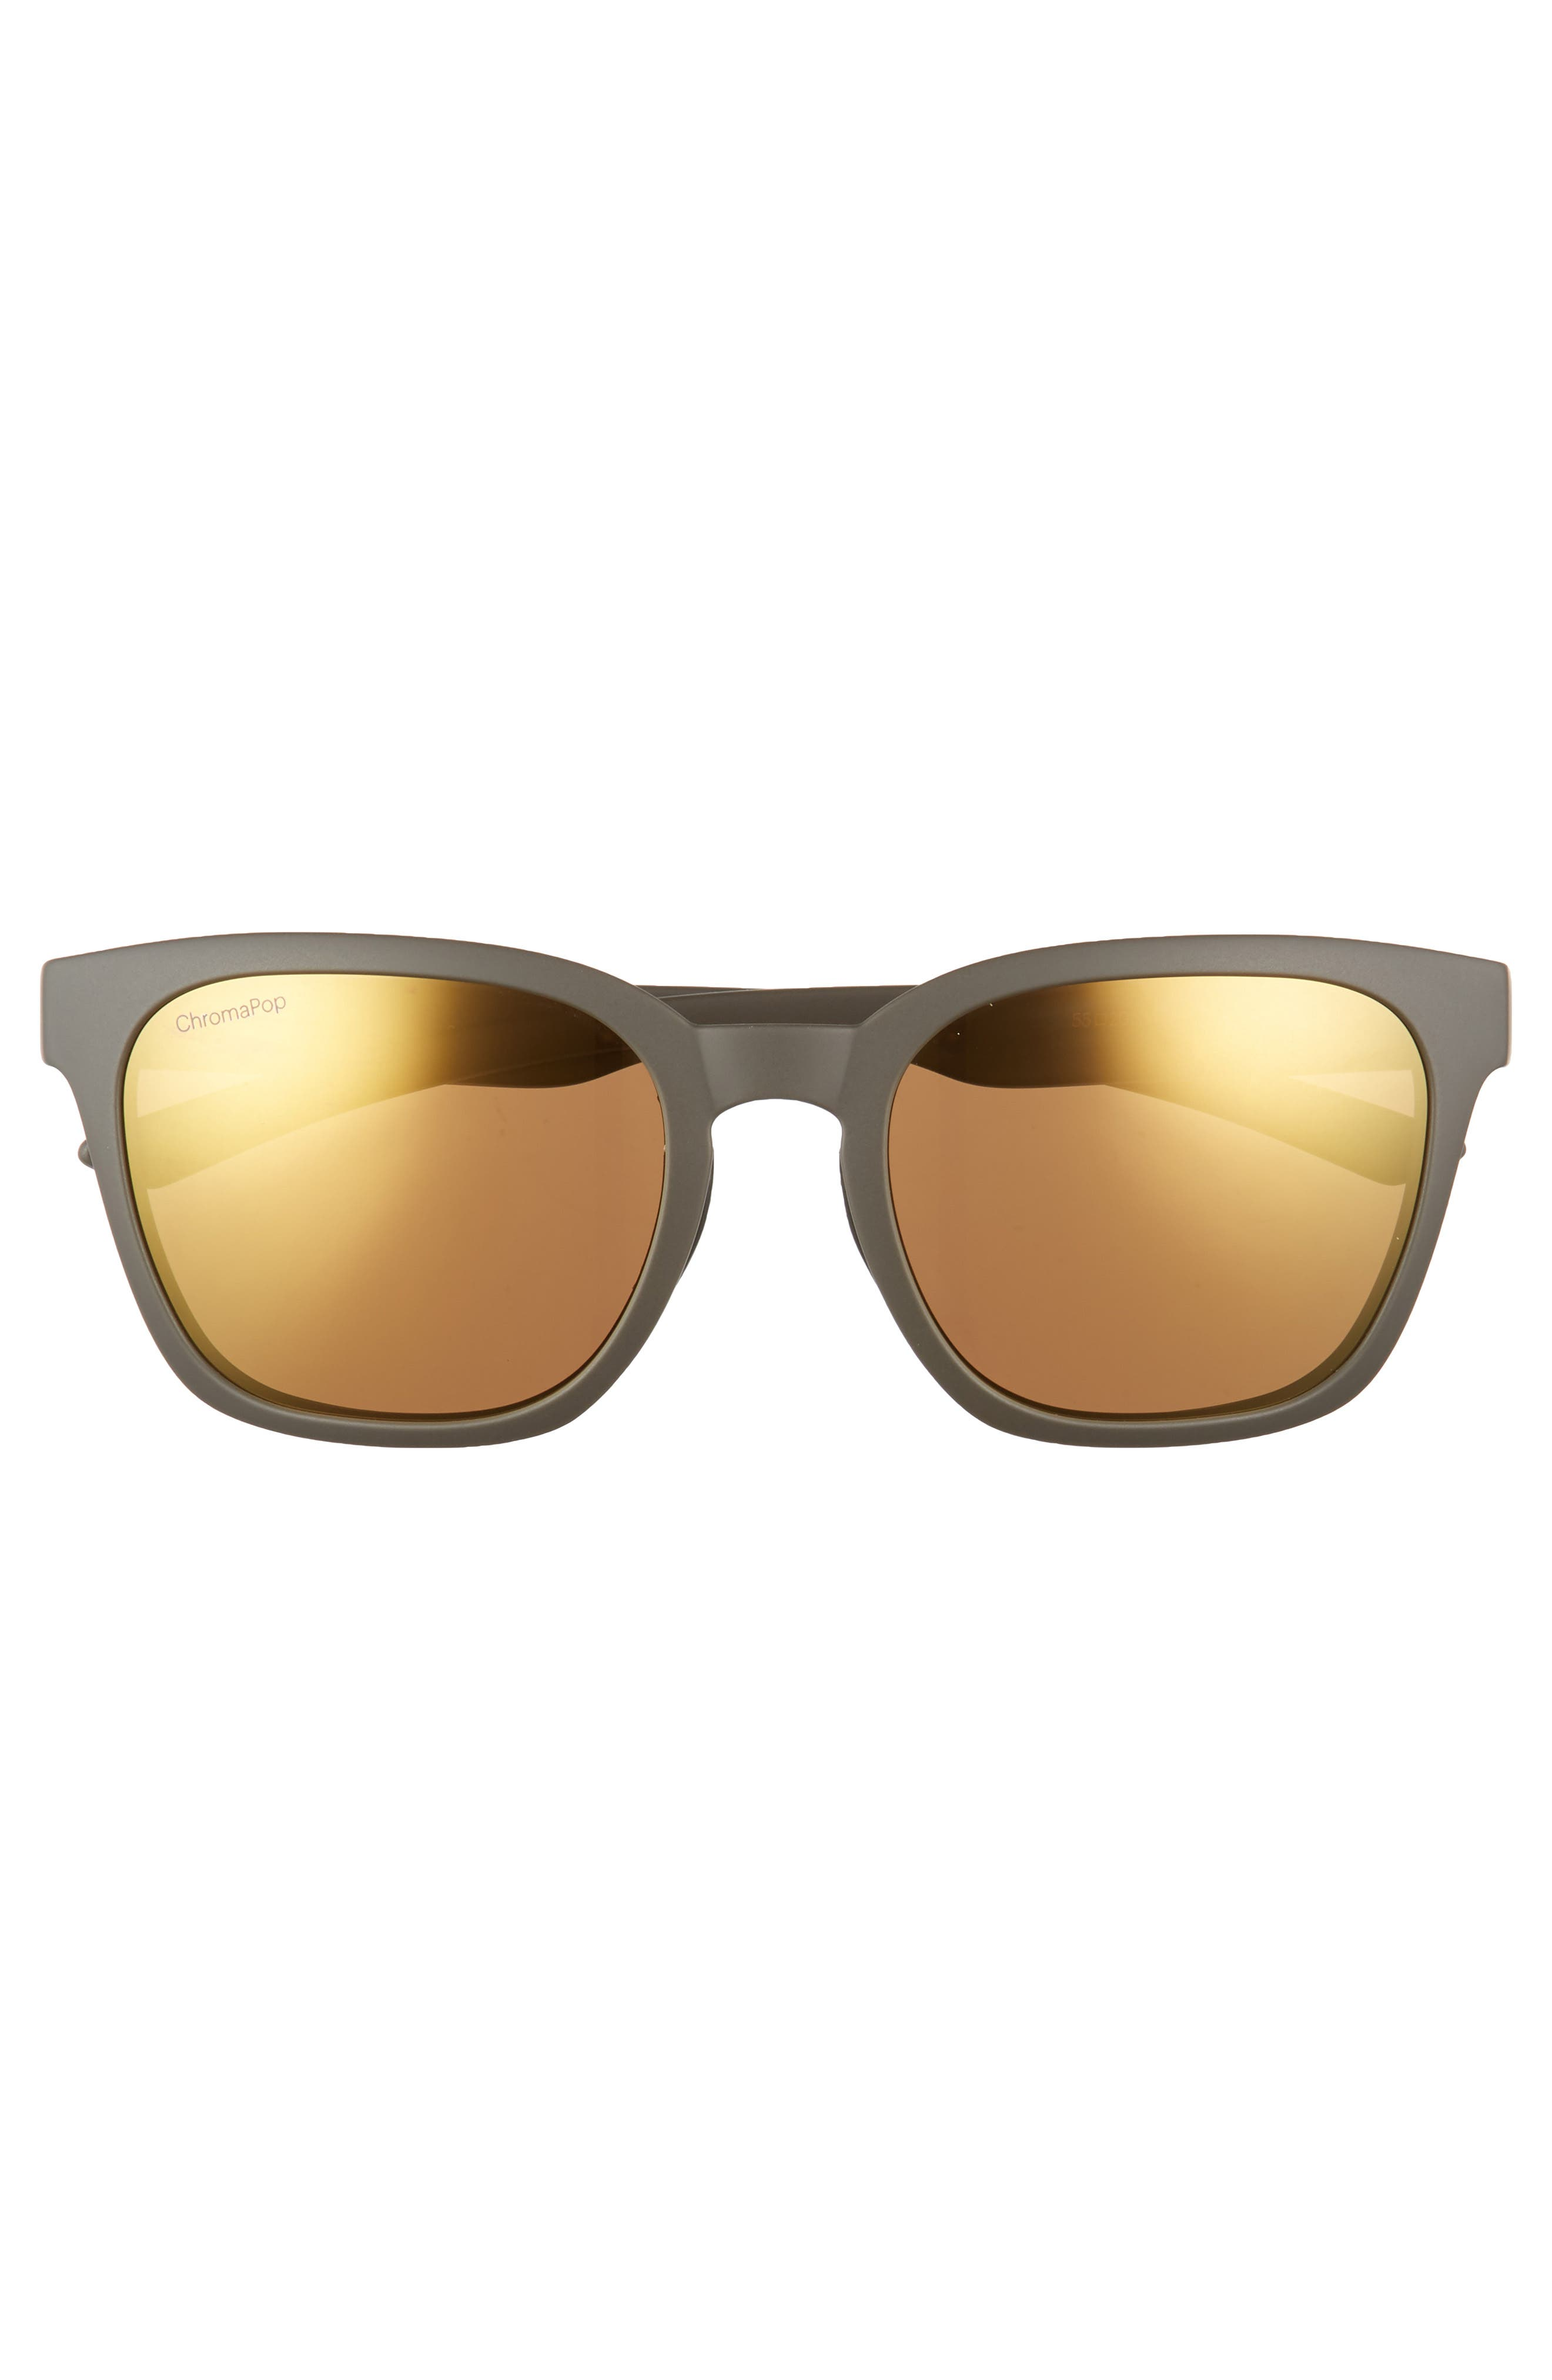 Founder 55mm ChromaPop<sup>™</sup> Polarized Sunglasses,                             Alternate thumbnail 3, color,                             Matte Gravy